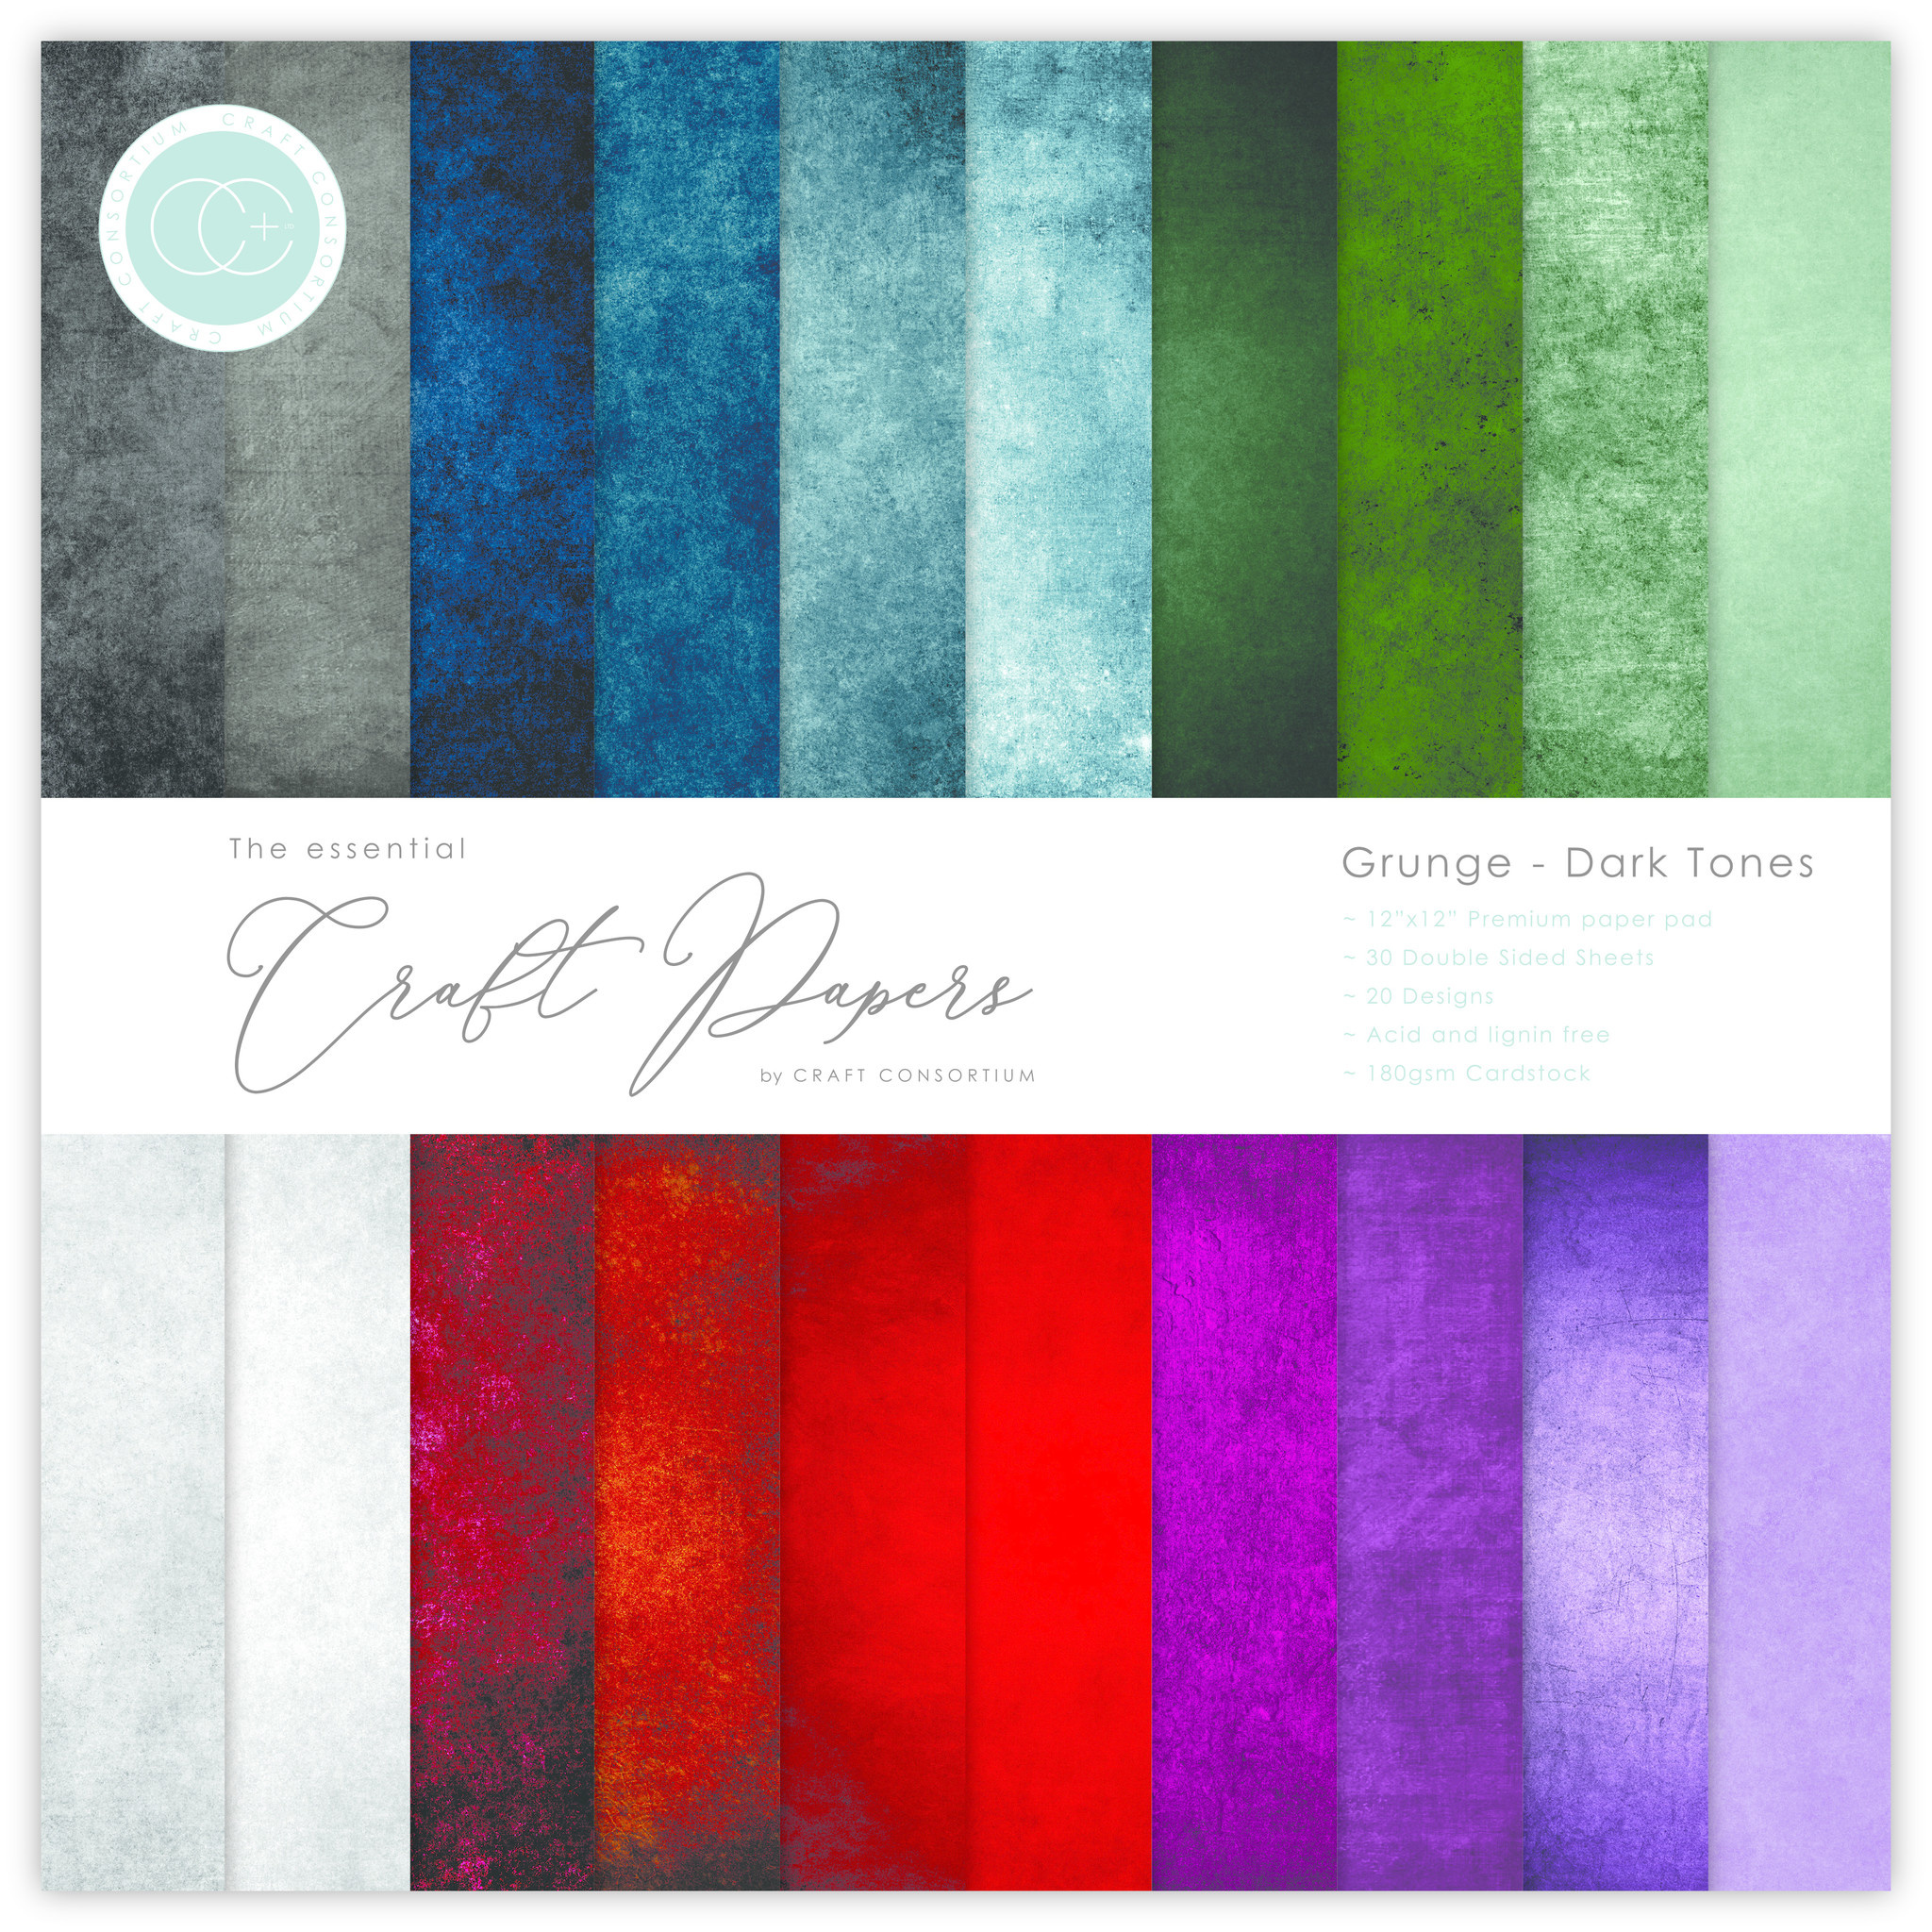 CCEPAD007B The Essential Craft Papers 6x6 Grunge - Dark Tones